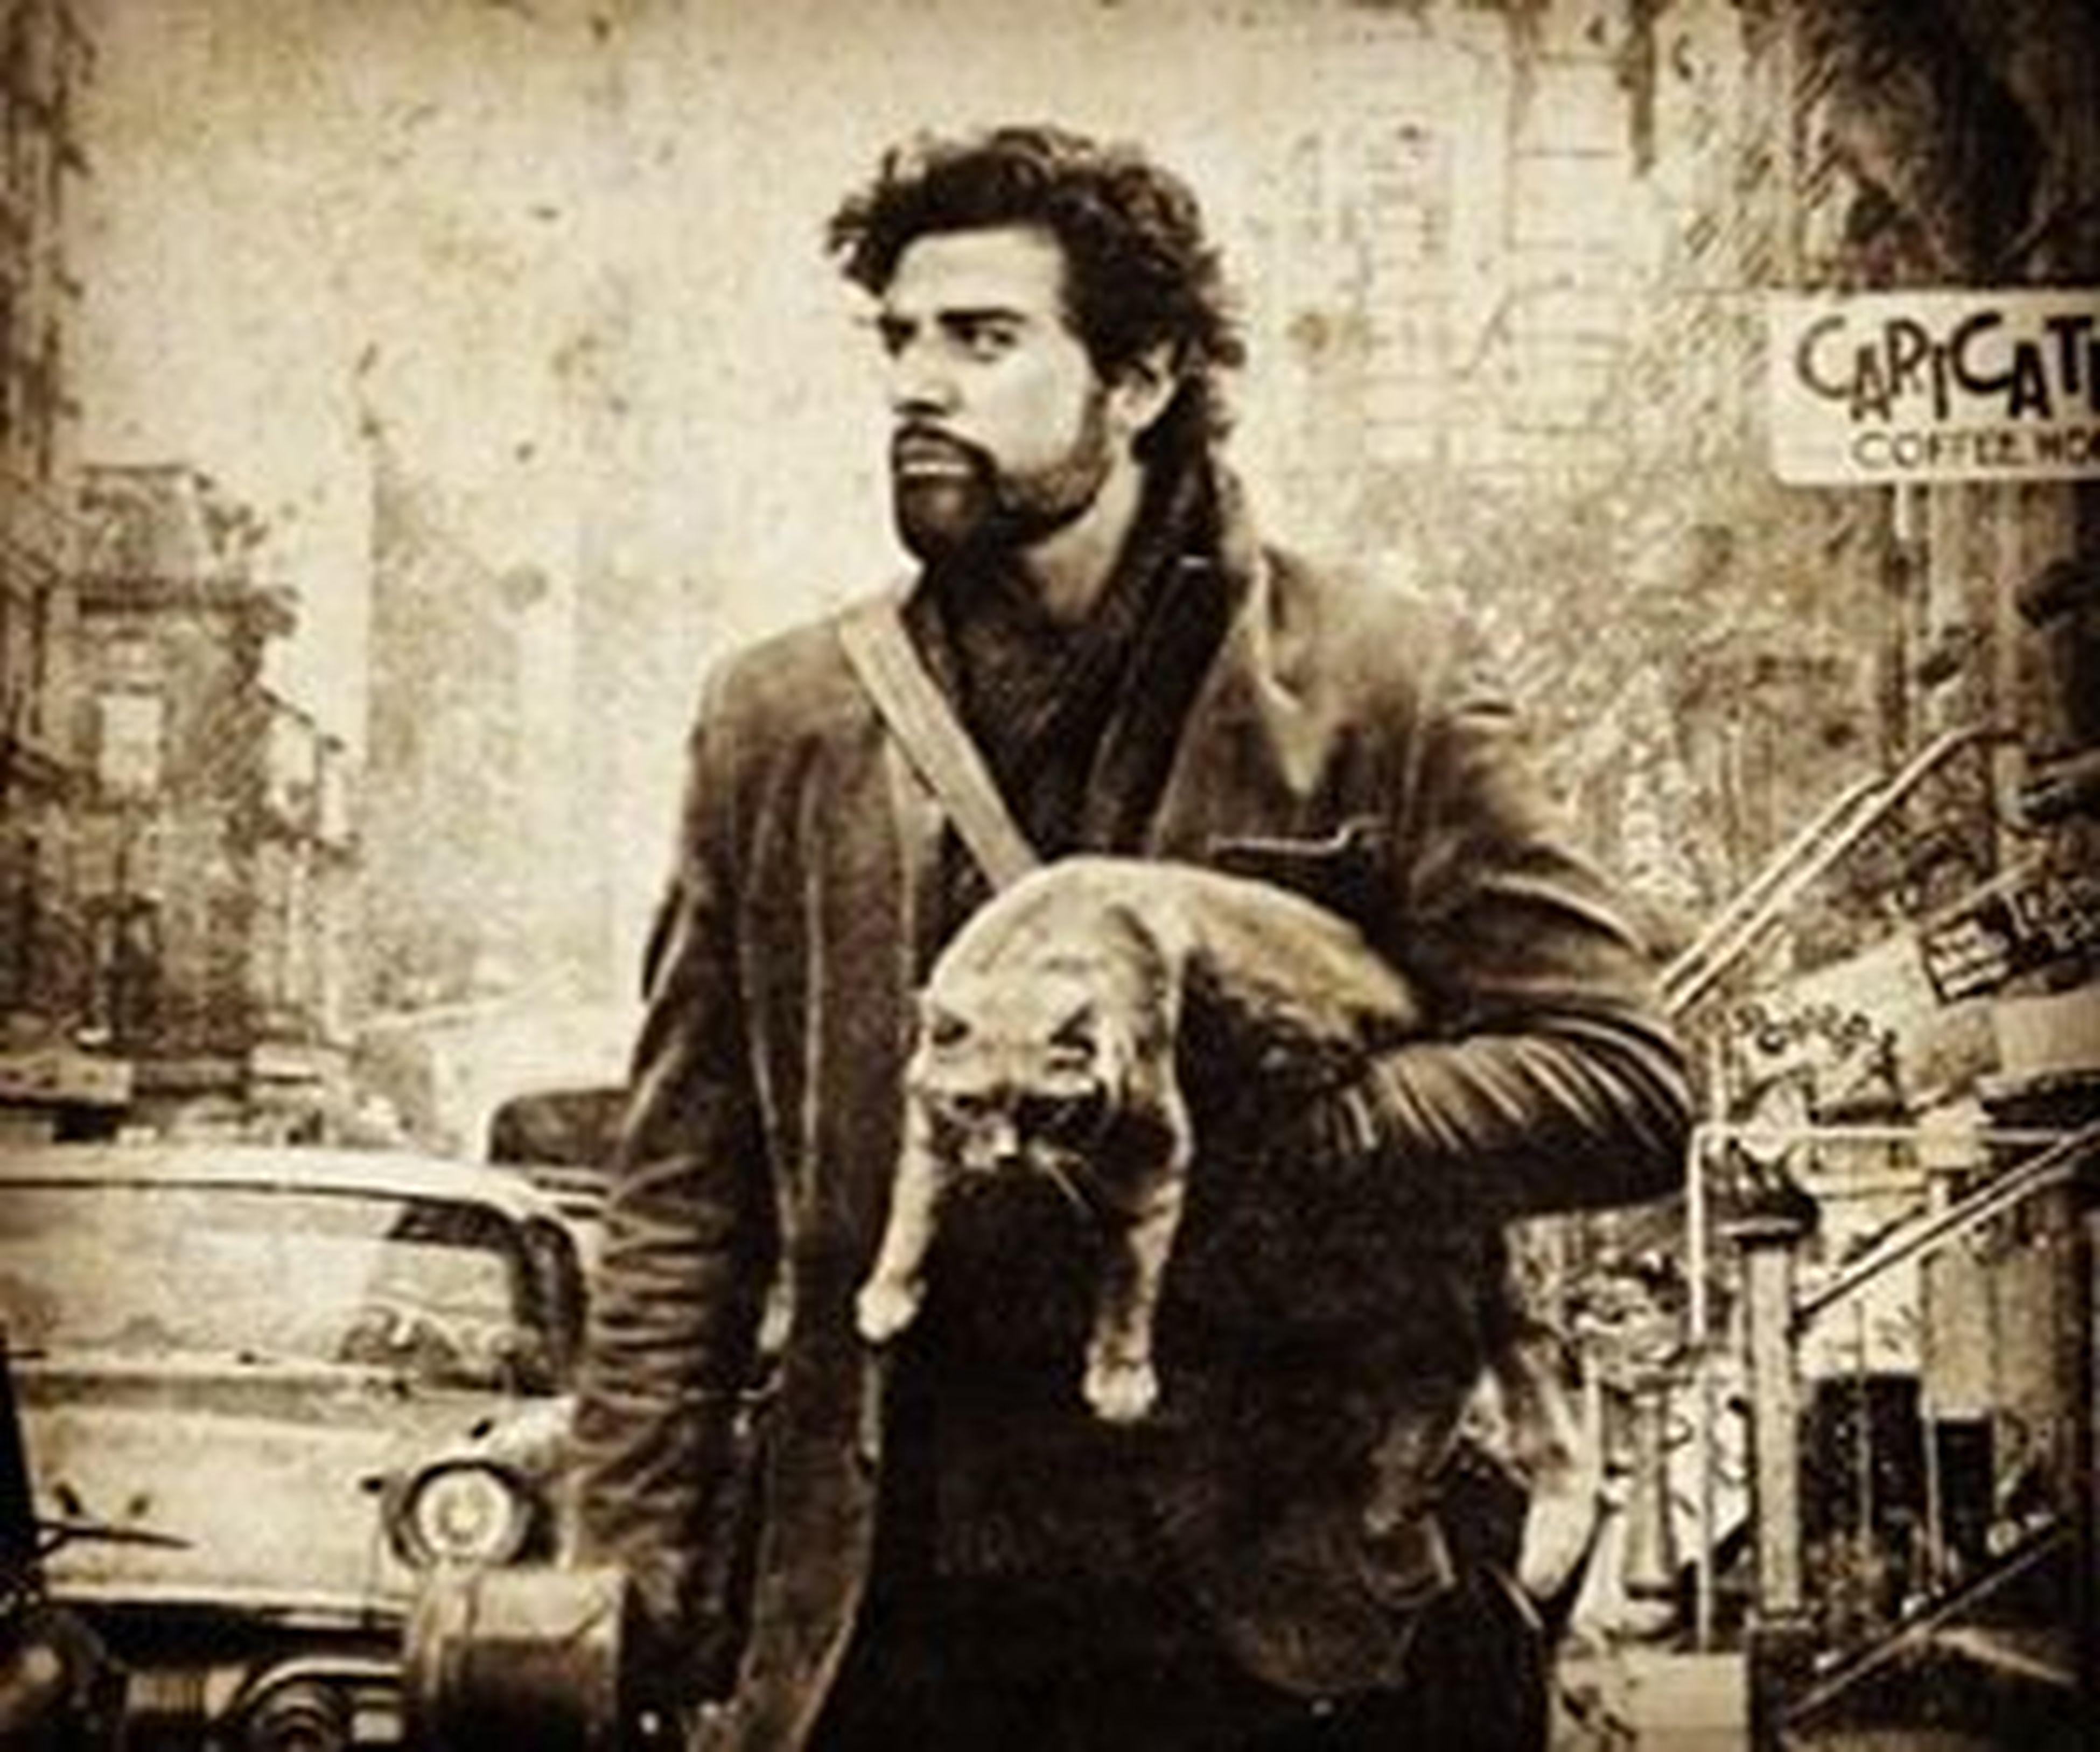 One of my favorite movies 🎬🎵🐱🌁 Insidellewyndavis MOVIE Film Urban Indie Alternative Folk Music 1961 Winter Oscarisaac Careymulligan JustinTimberlake 2013